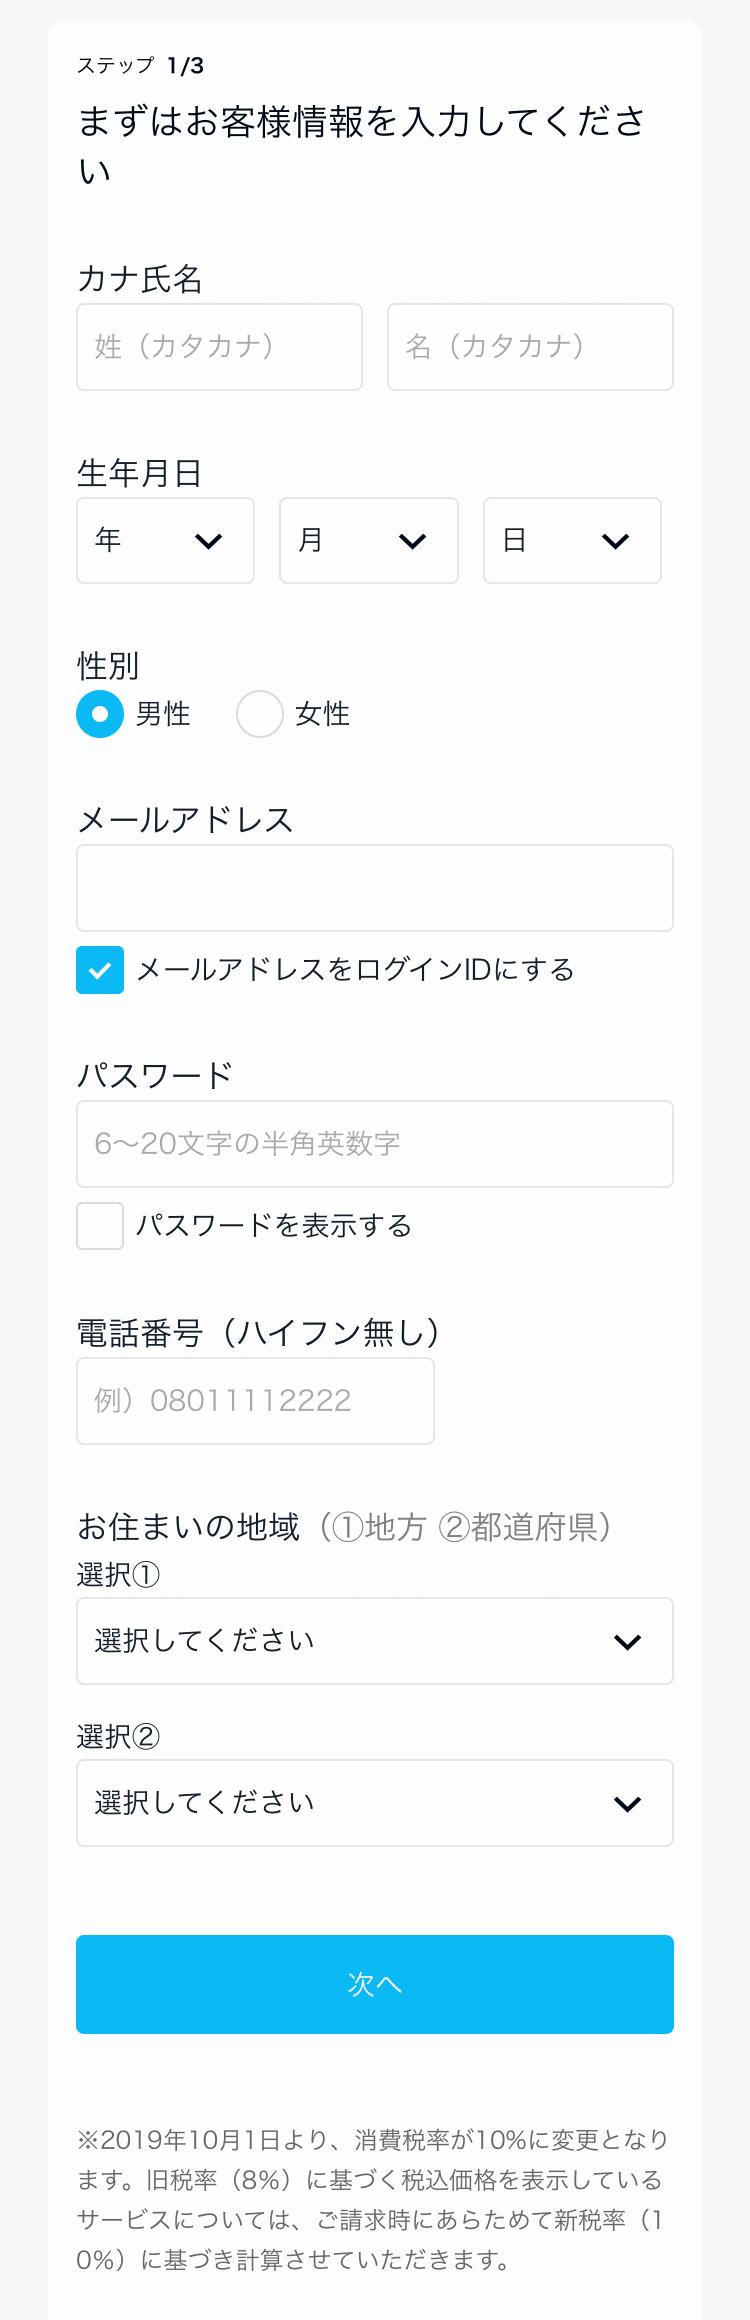 U-NEXT お客様情報入力画面